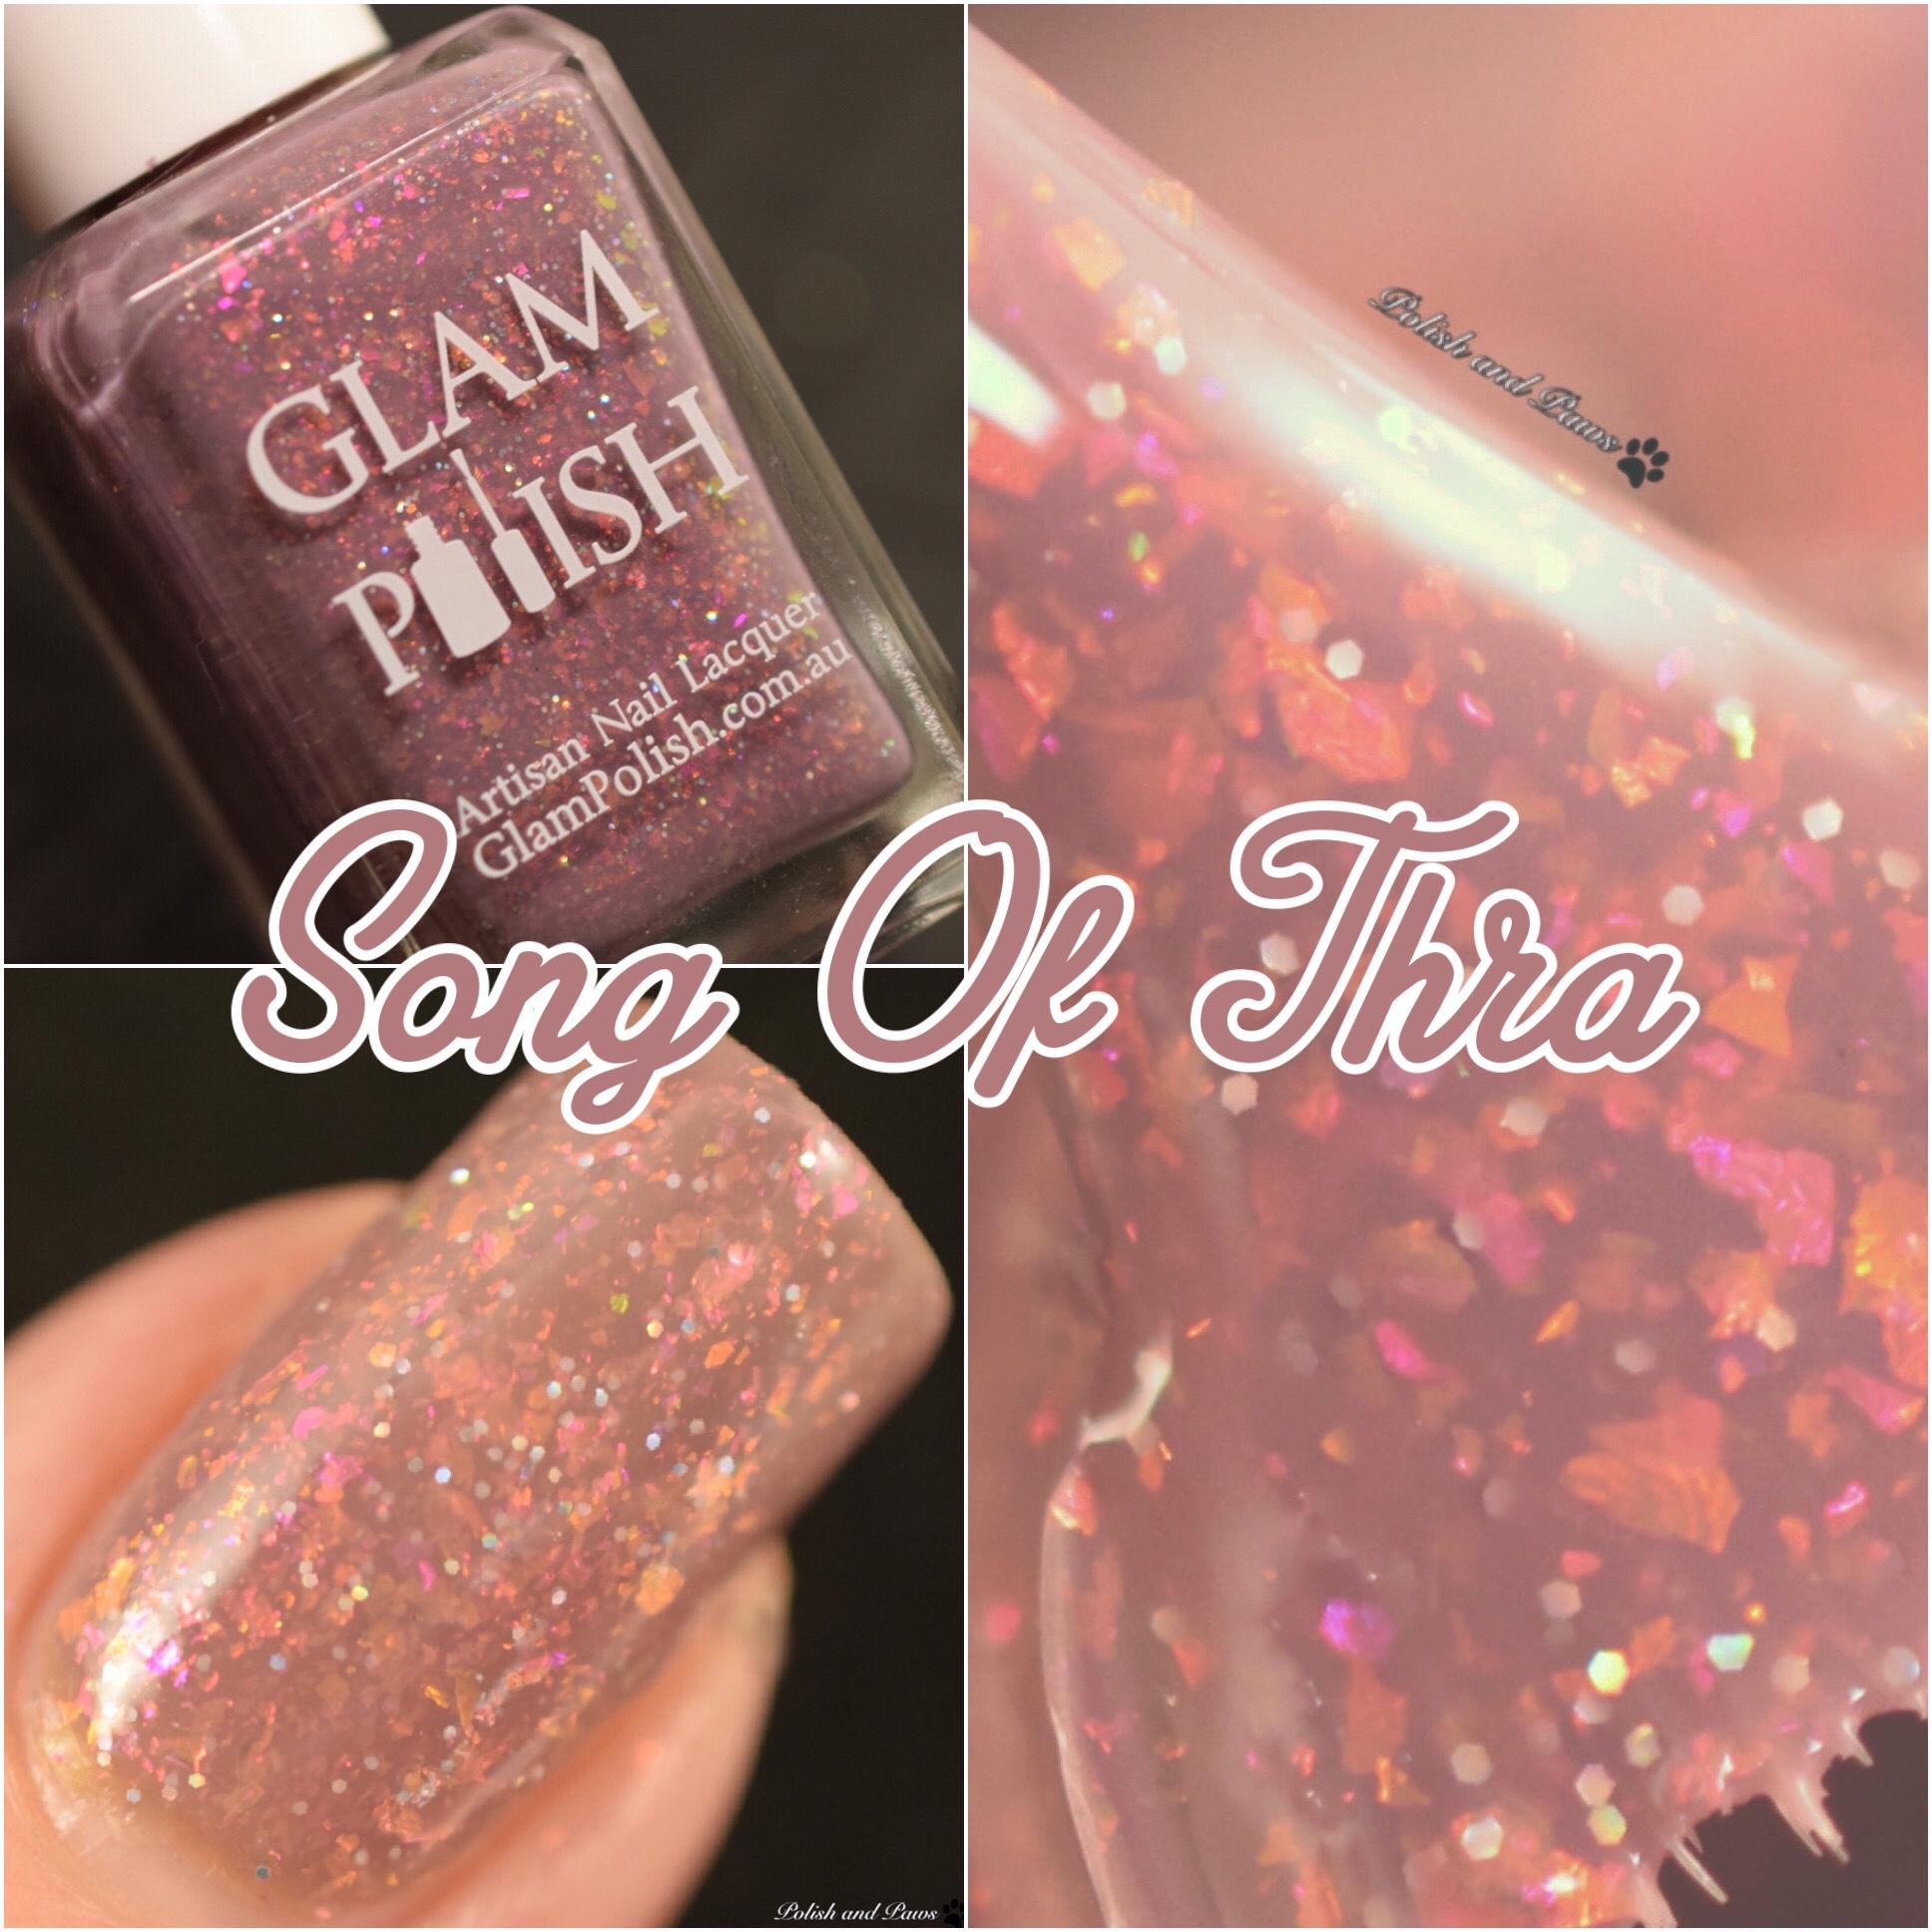 Glam Polish Song of Thra